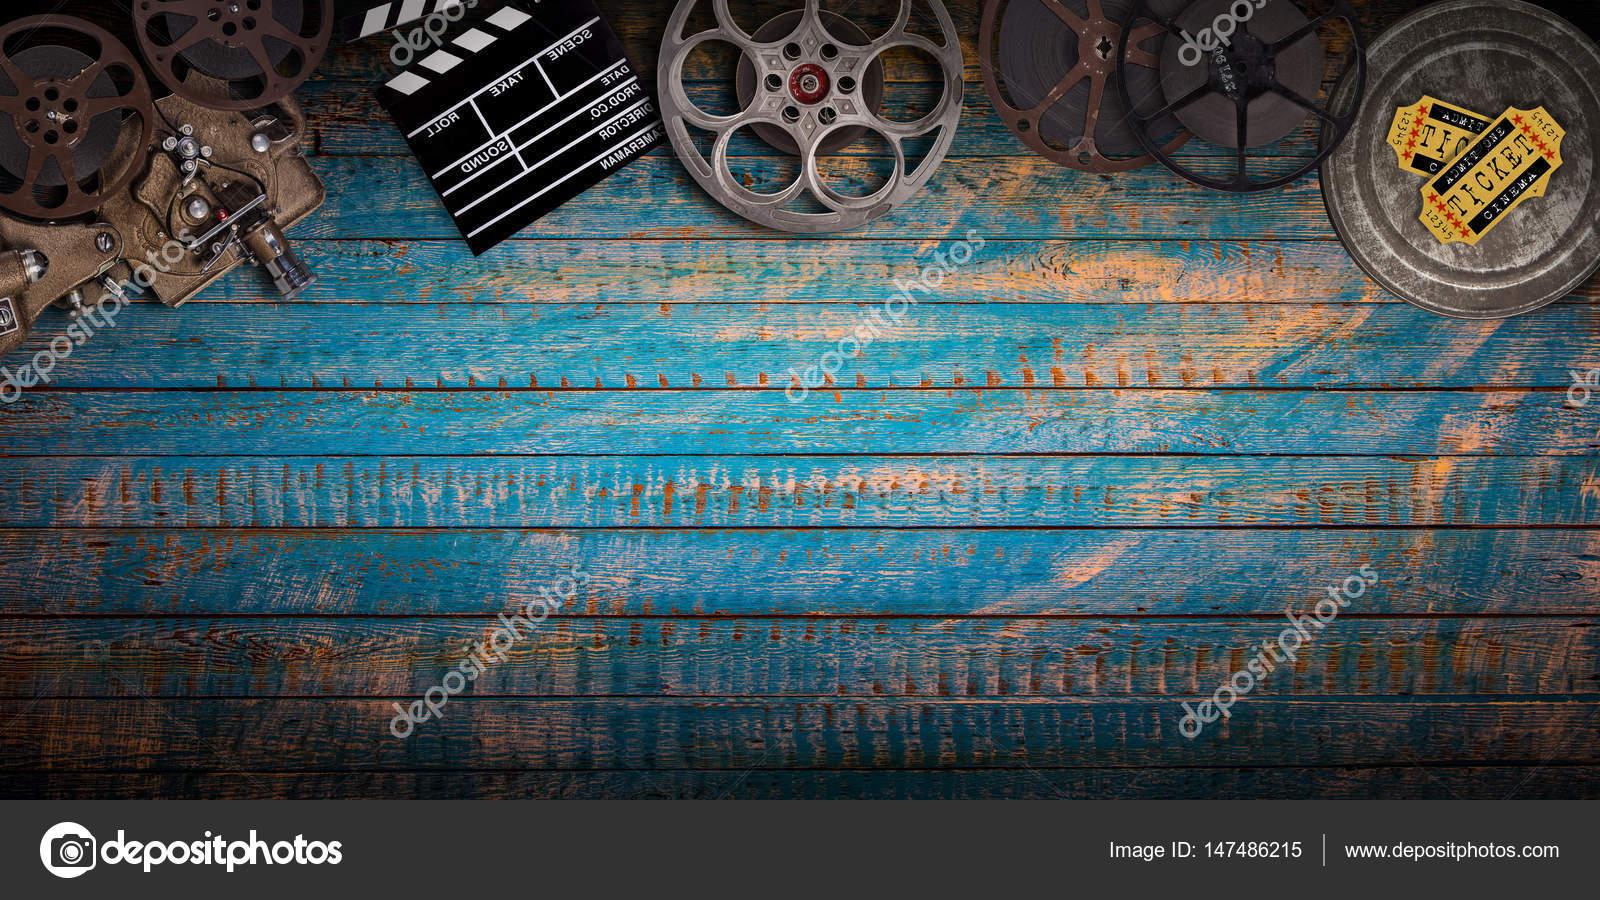 Cinema Concept Of Vintage Film Reels Clapperboard And Projector